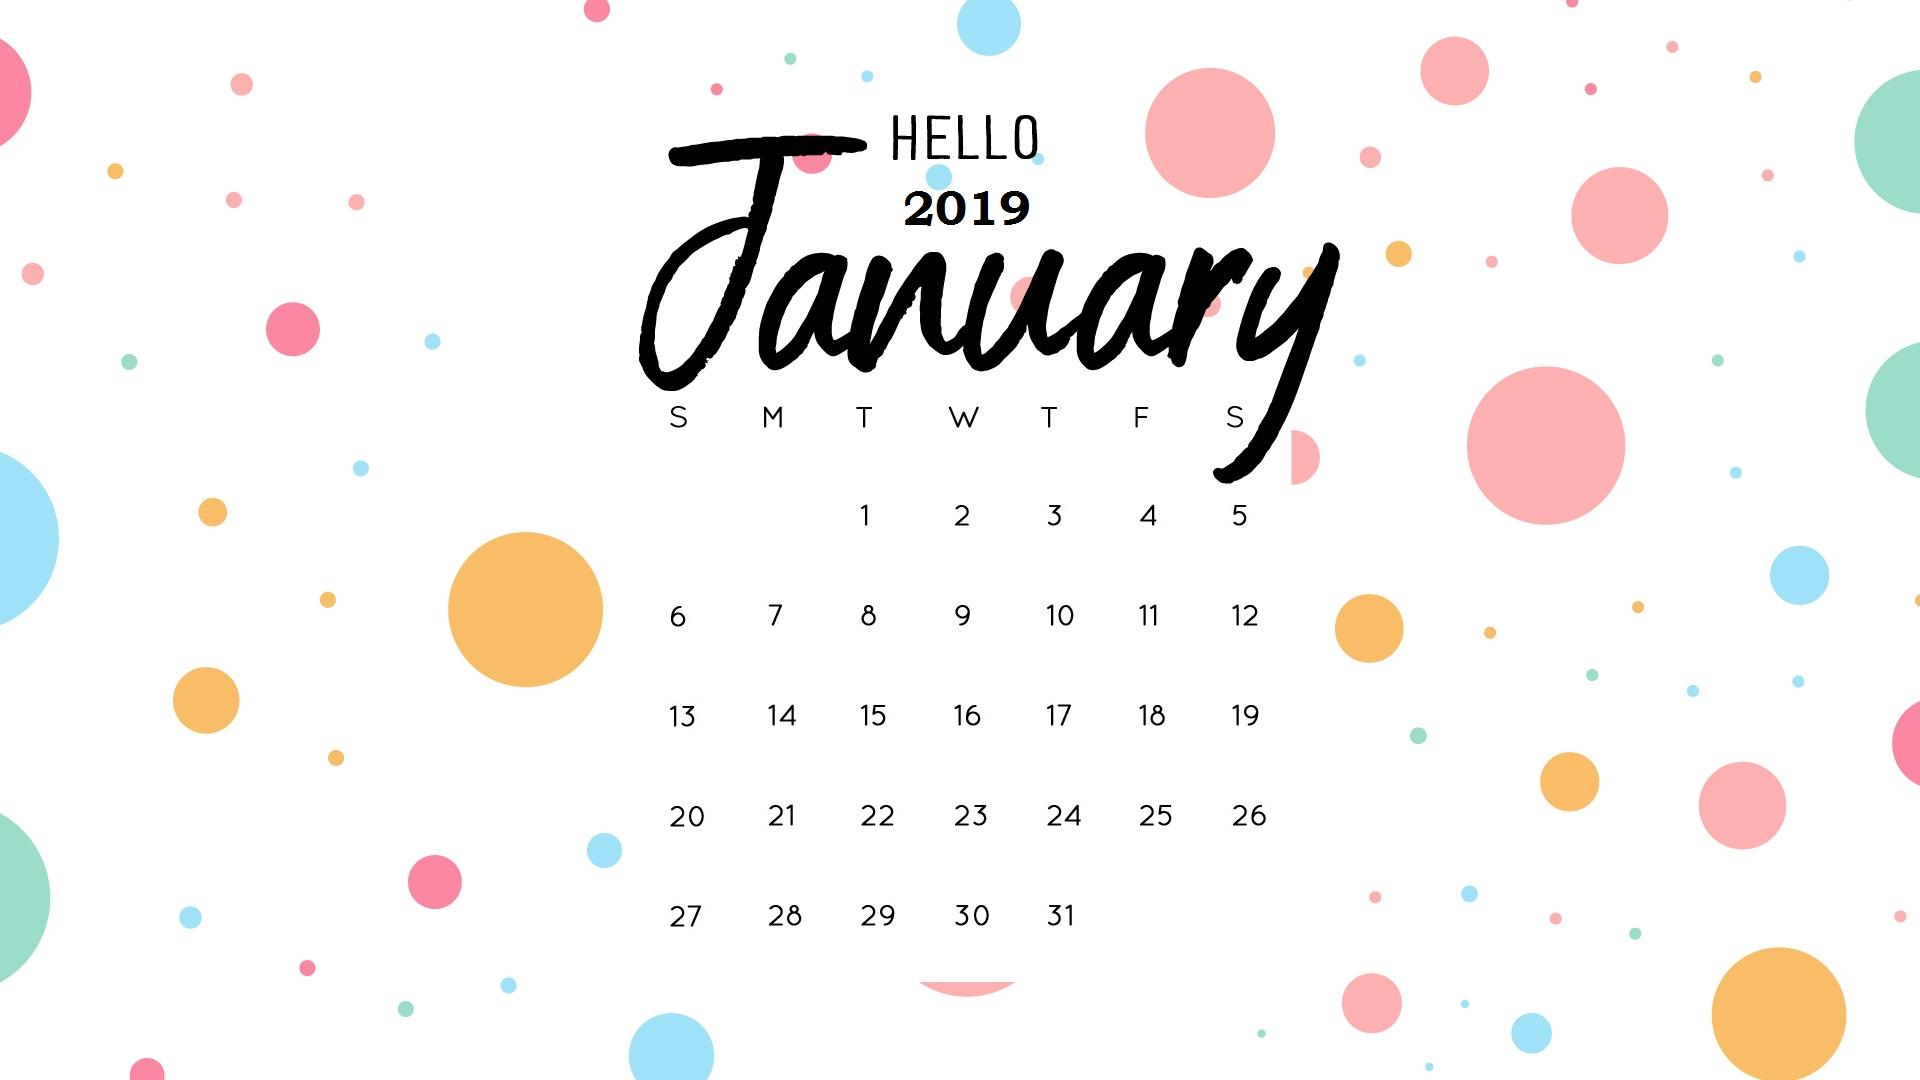 January 2019 HD Calendar Wallpapers Calendar 2019 1920x1080